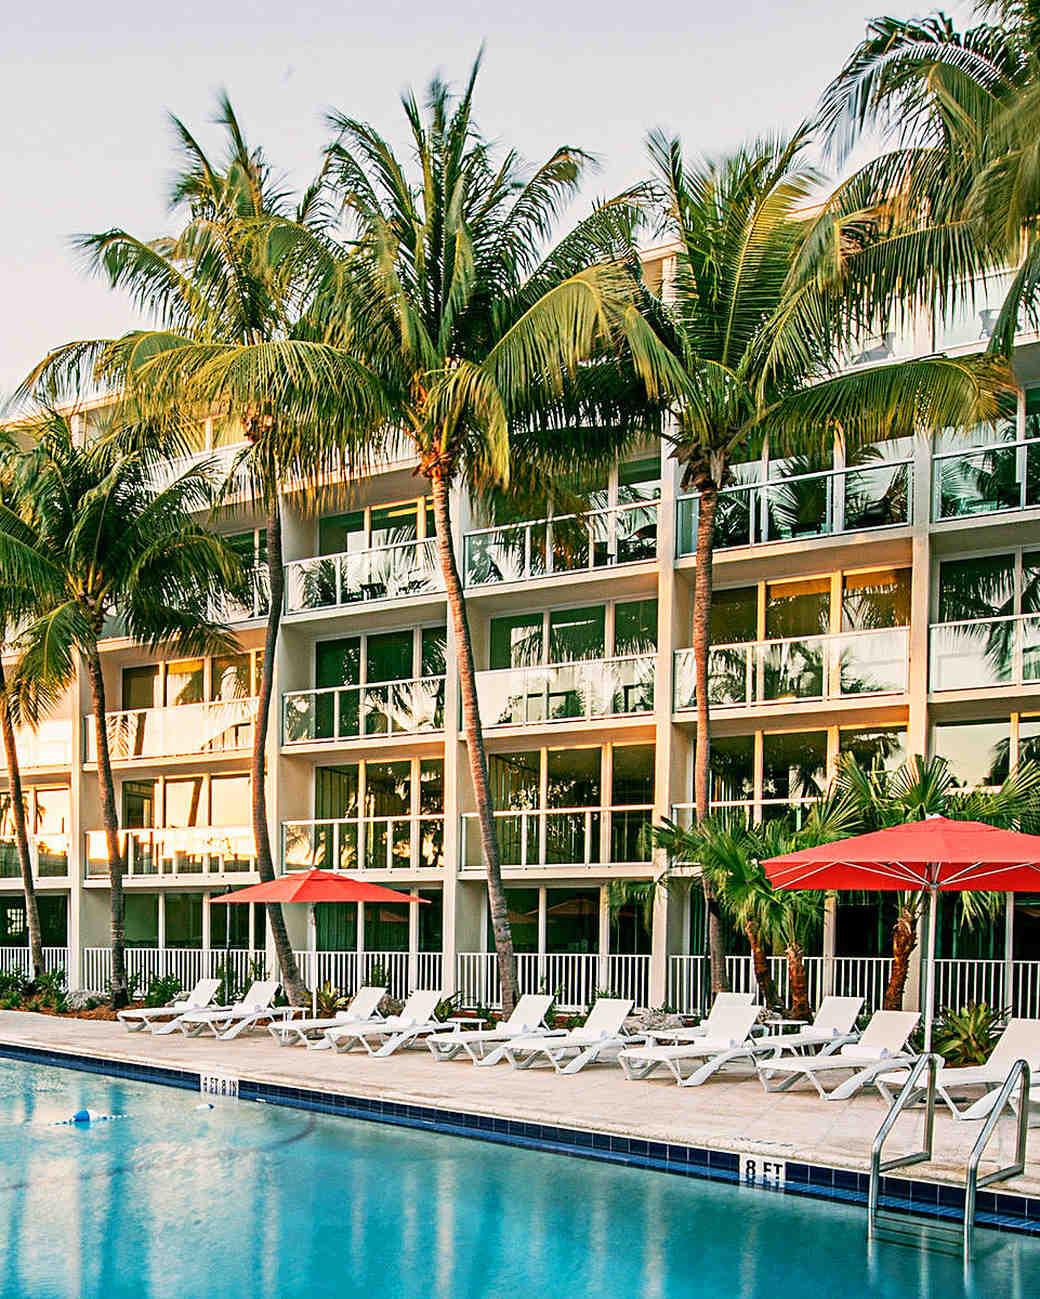 florida keys hotels amara cay resort